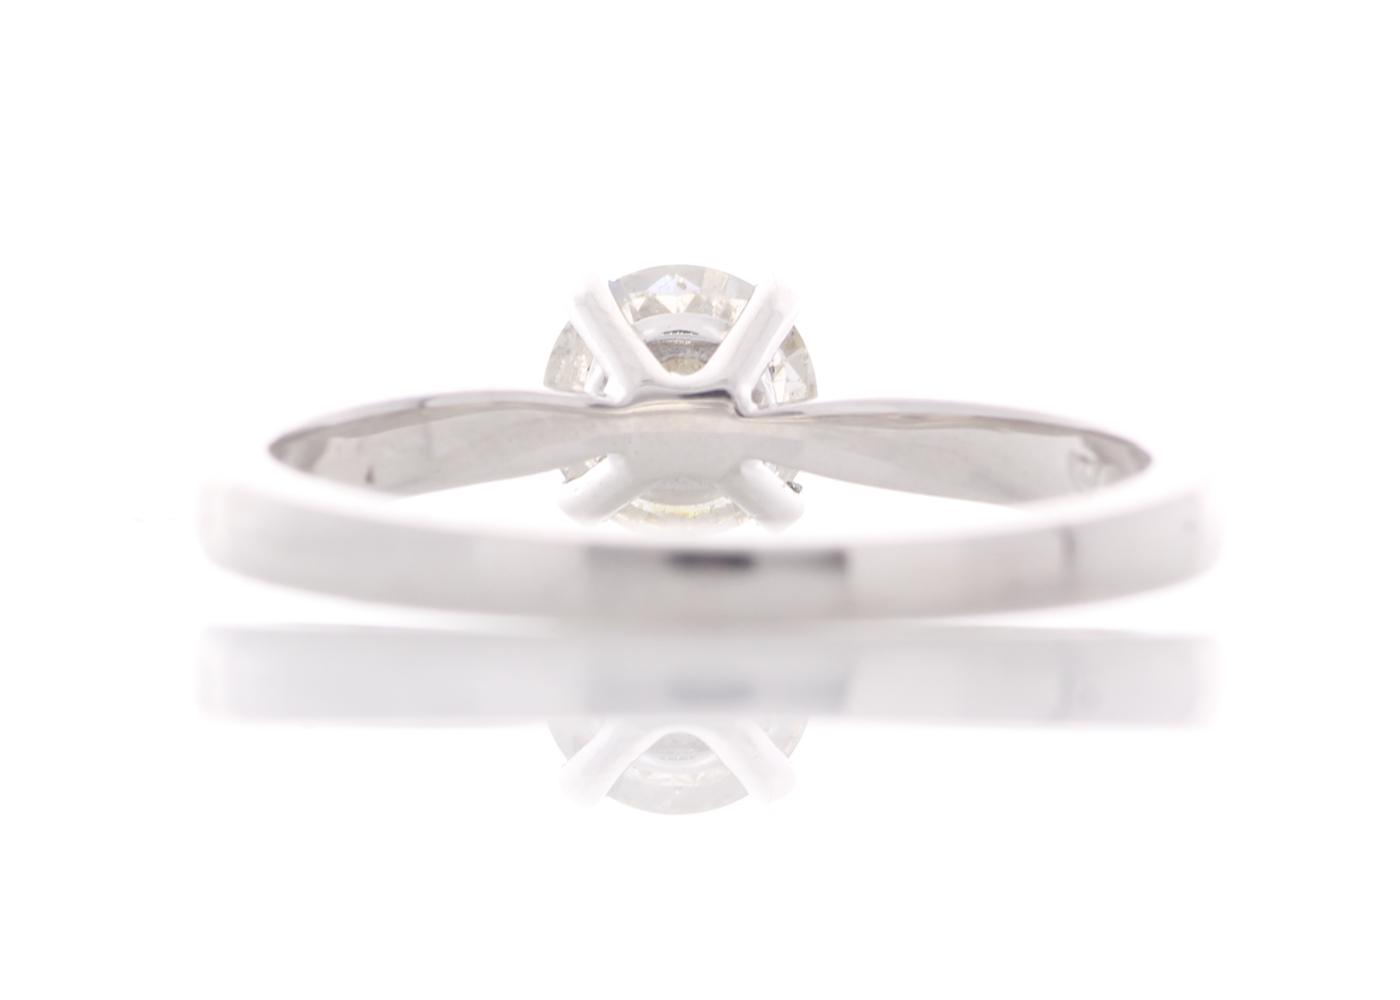 18k White Gold Prong Set Diamond Ring 0.57 Carats - Image 3 of 5